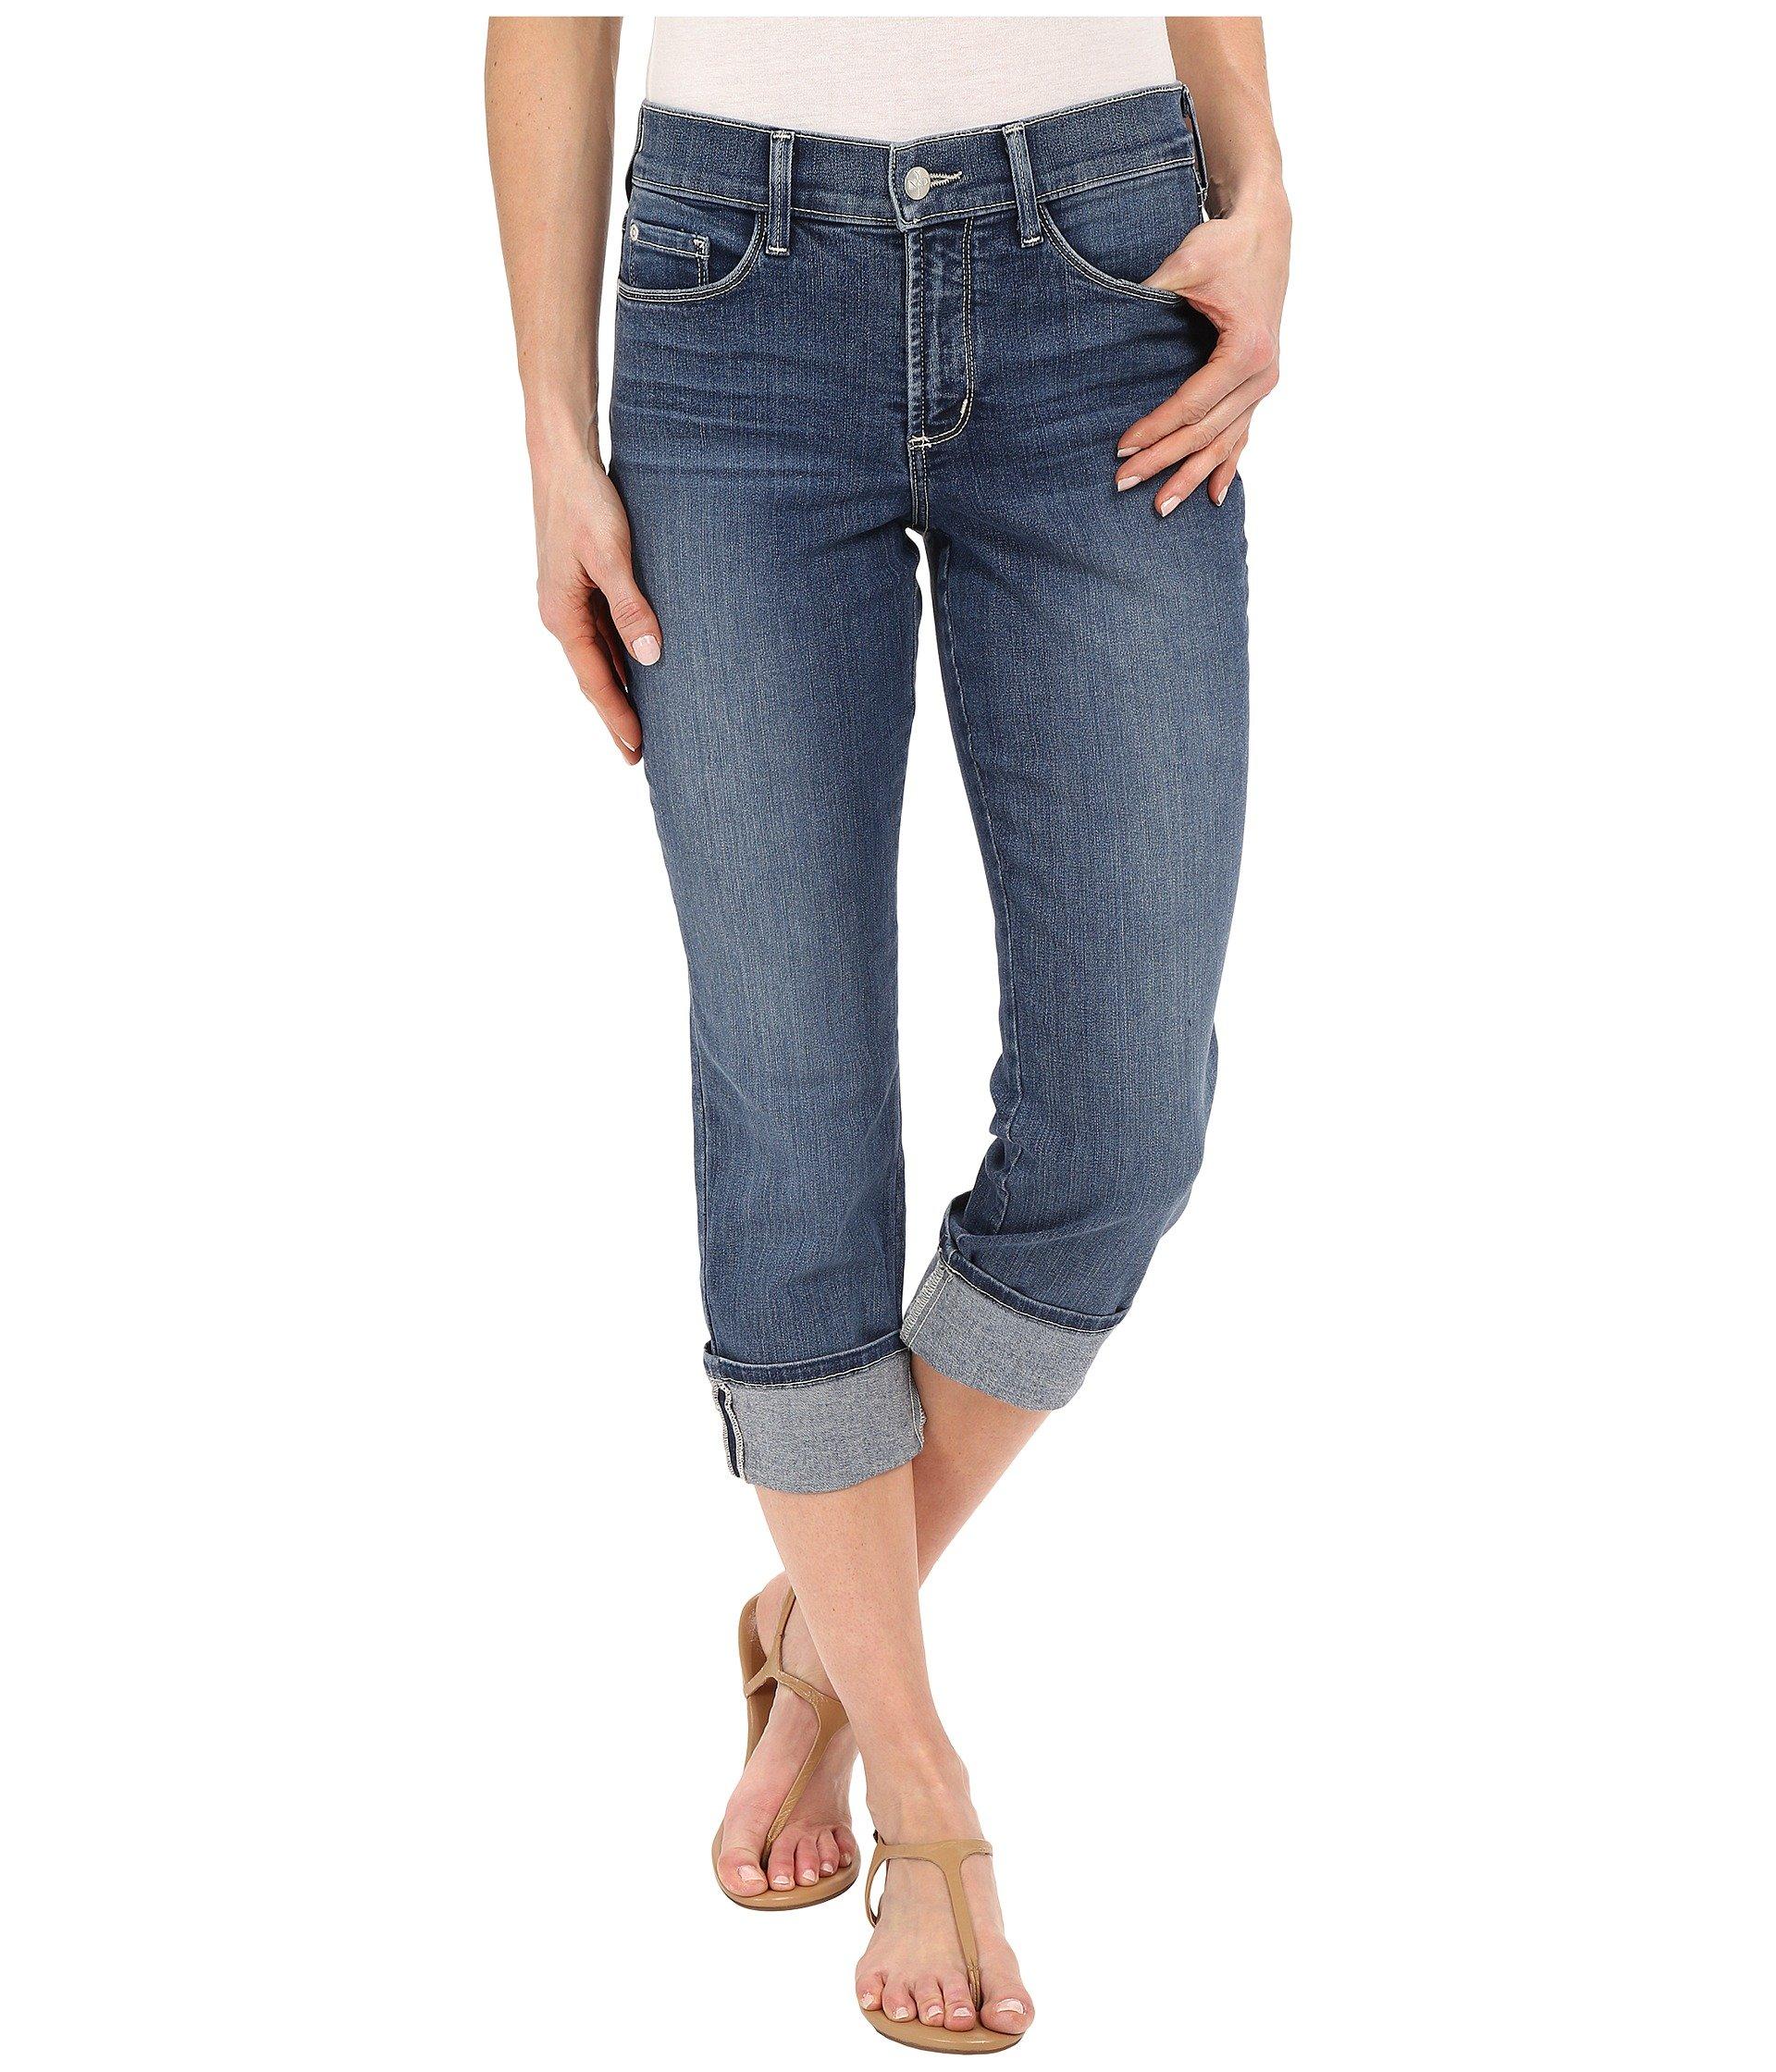 heyburn women Discount nydj alina stretch skinny jeans (heyburn) (regular petite), up to 95% off women's clothing & apparel shop at swapcom.